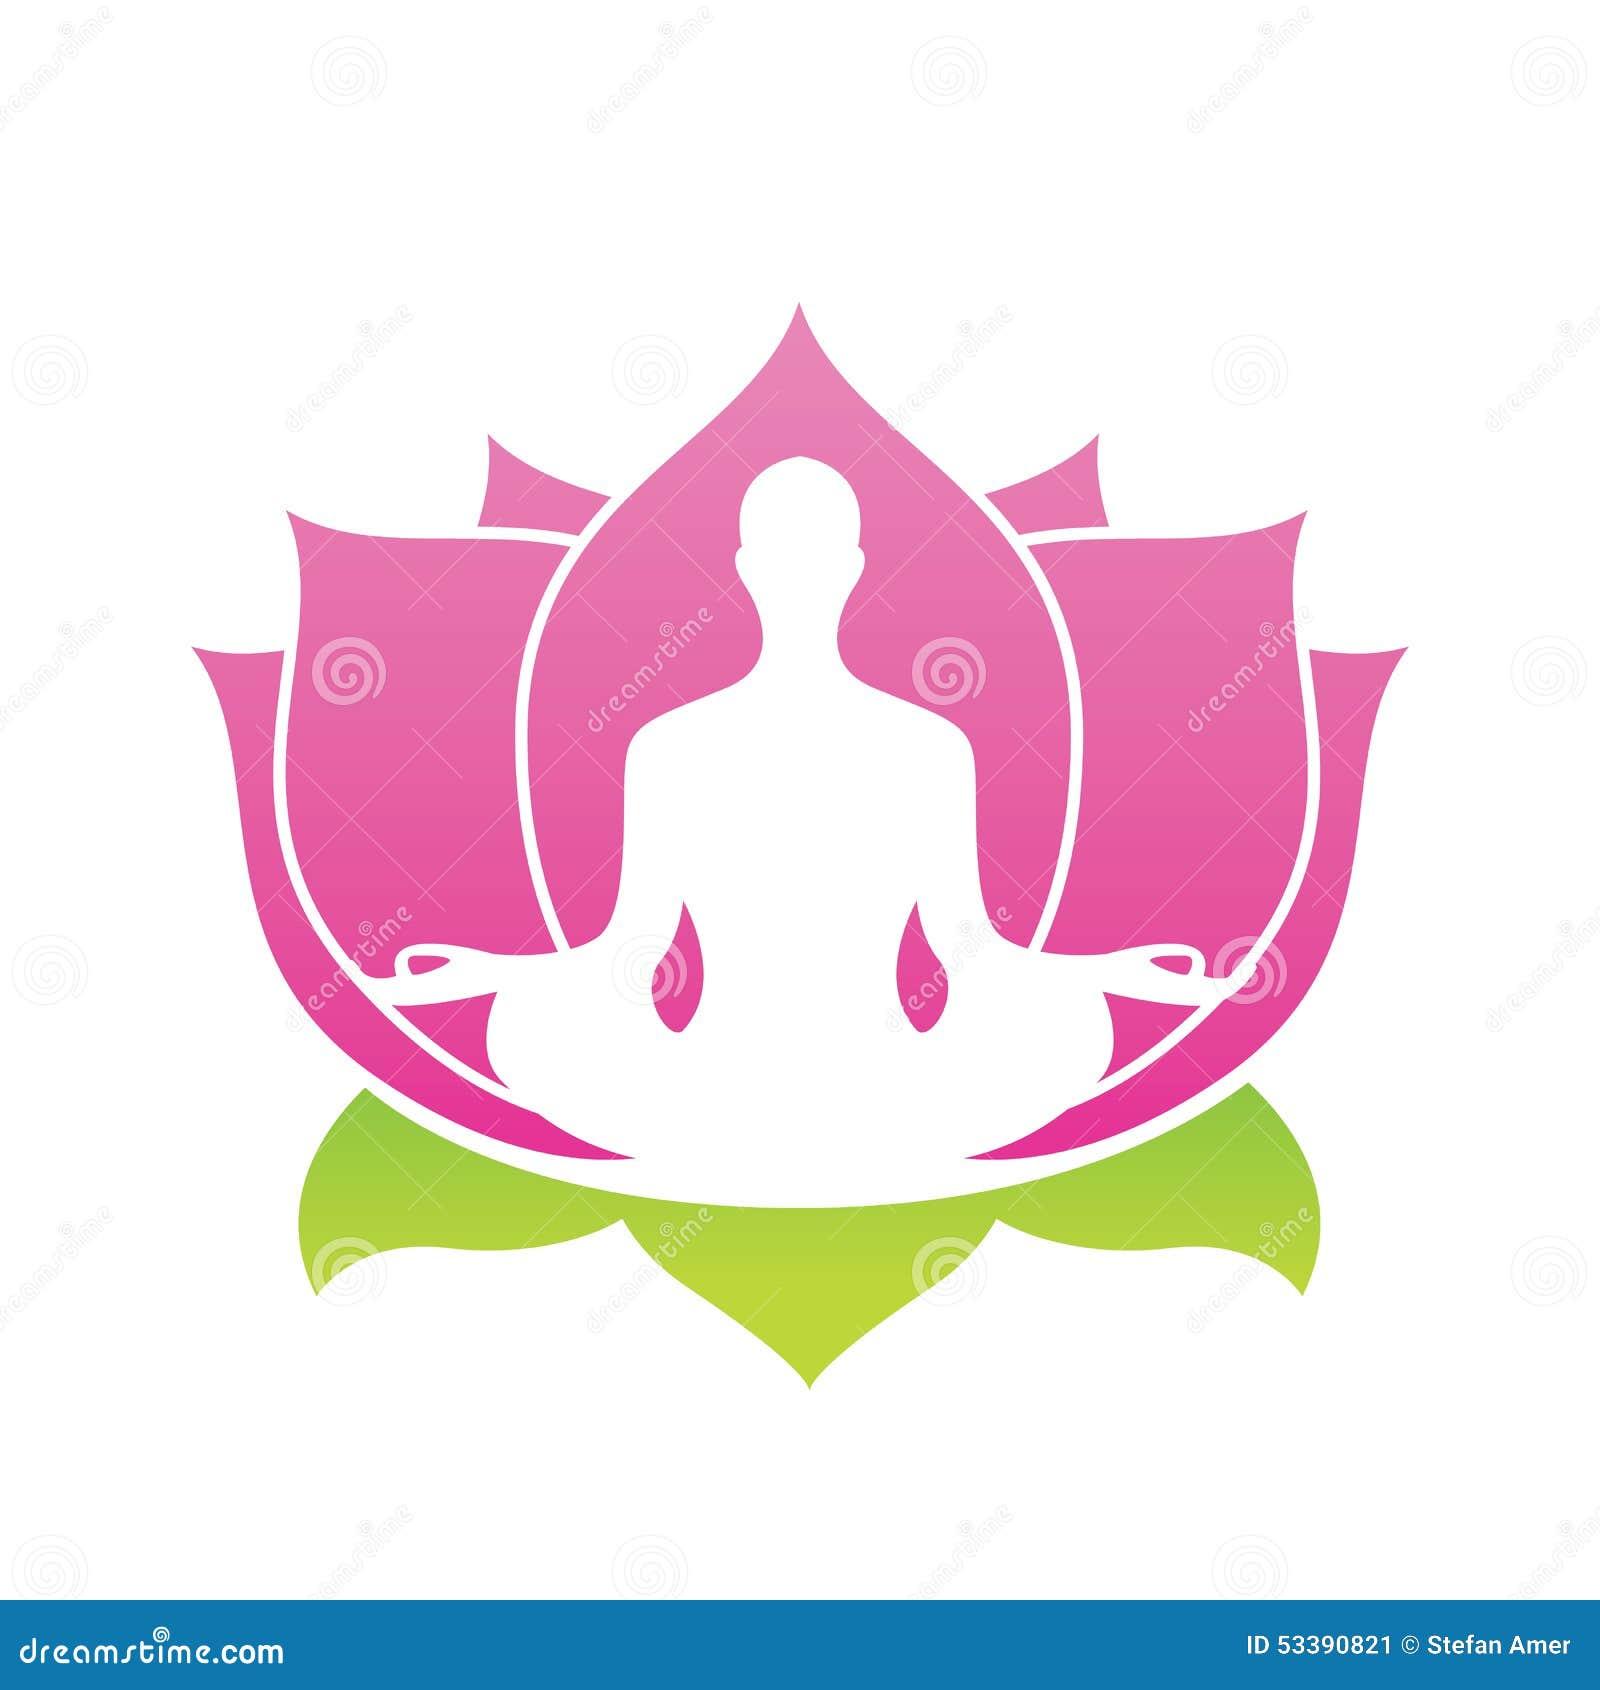 Lotus flower abstract vector logo yoga asana illustration stock lotus flower abstract vector logo yoga asana illustration stock vector illustration of creative corporate 53390821 mightylinksfo